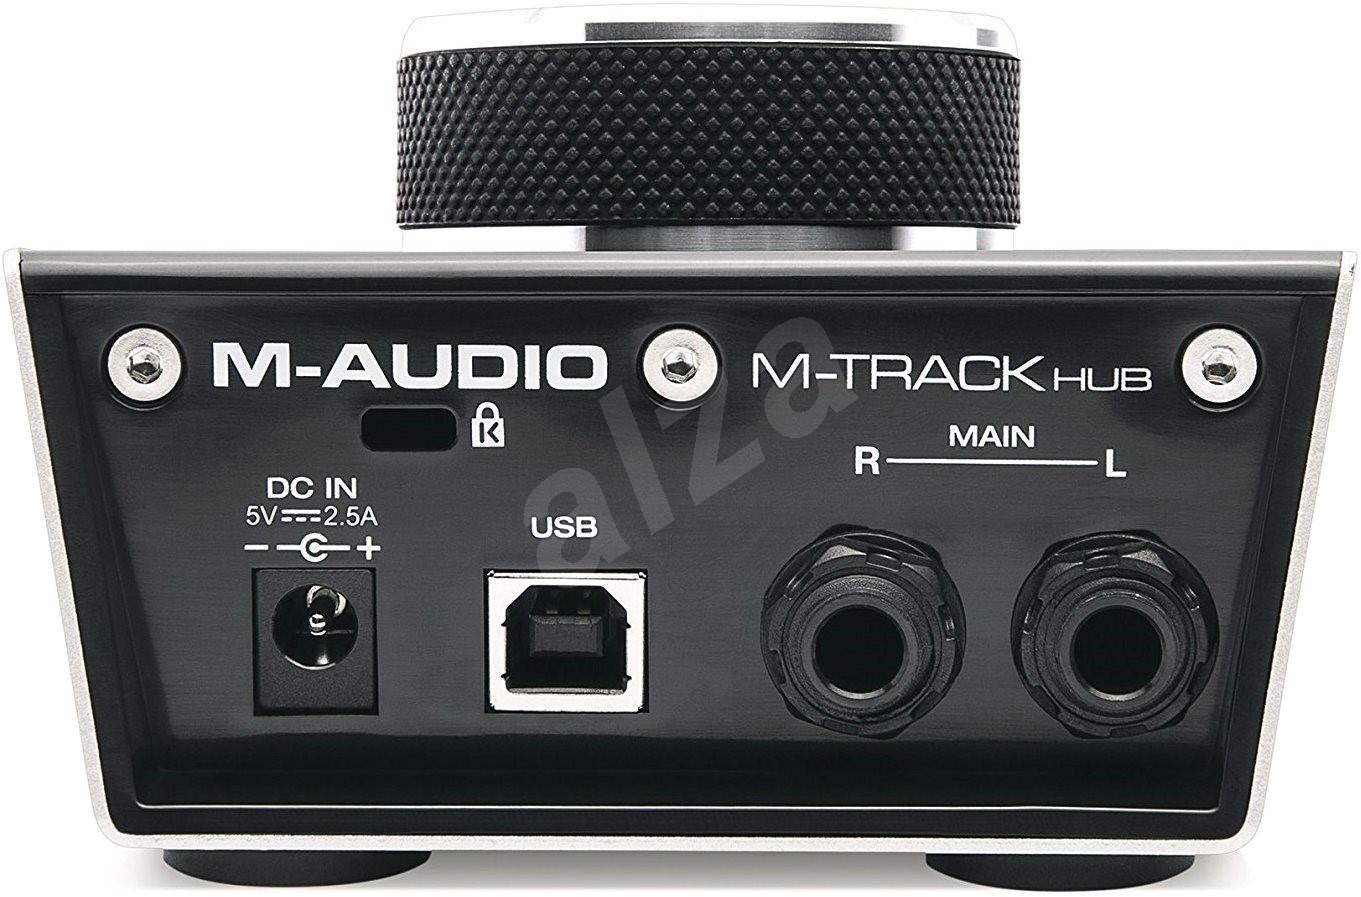 m audio m track hub sound card. Black Bedroom Furniture Sets. Home Design Ideas